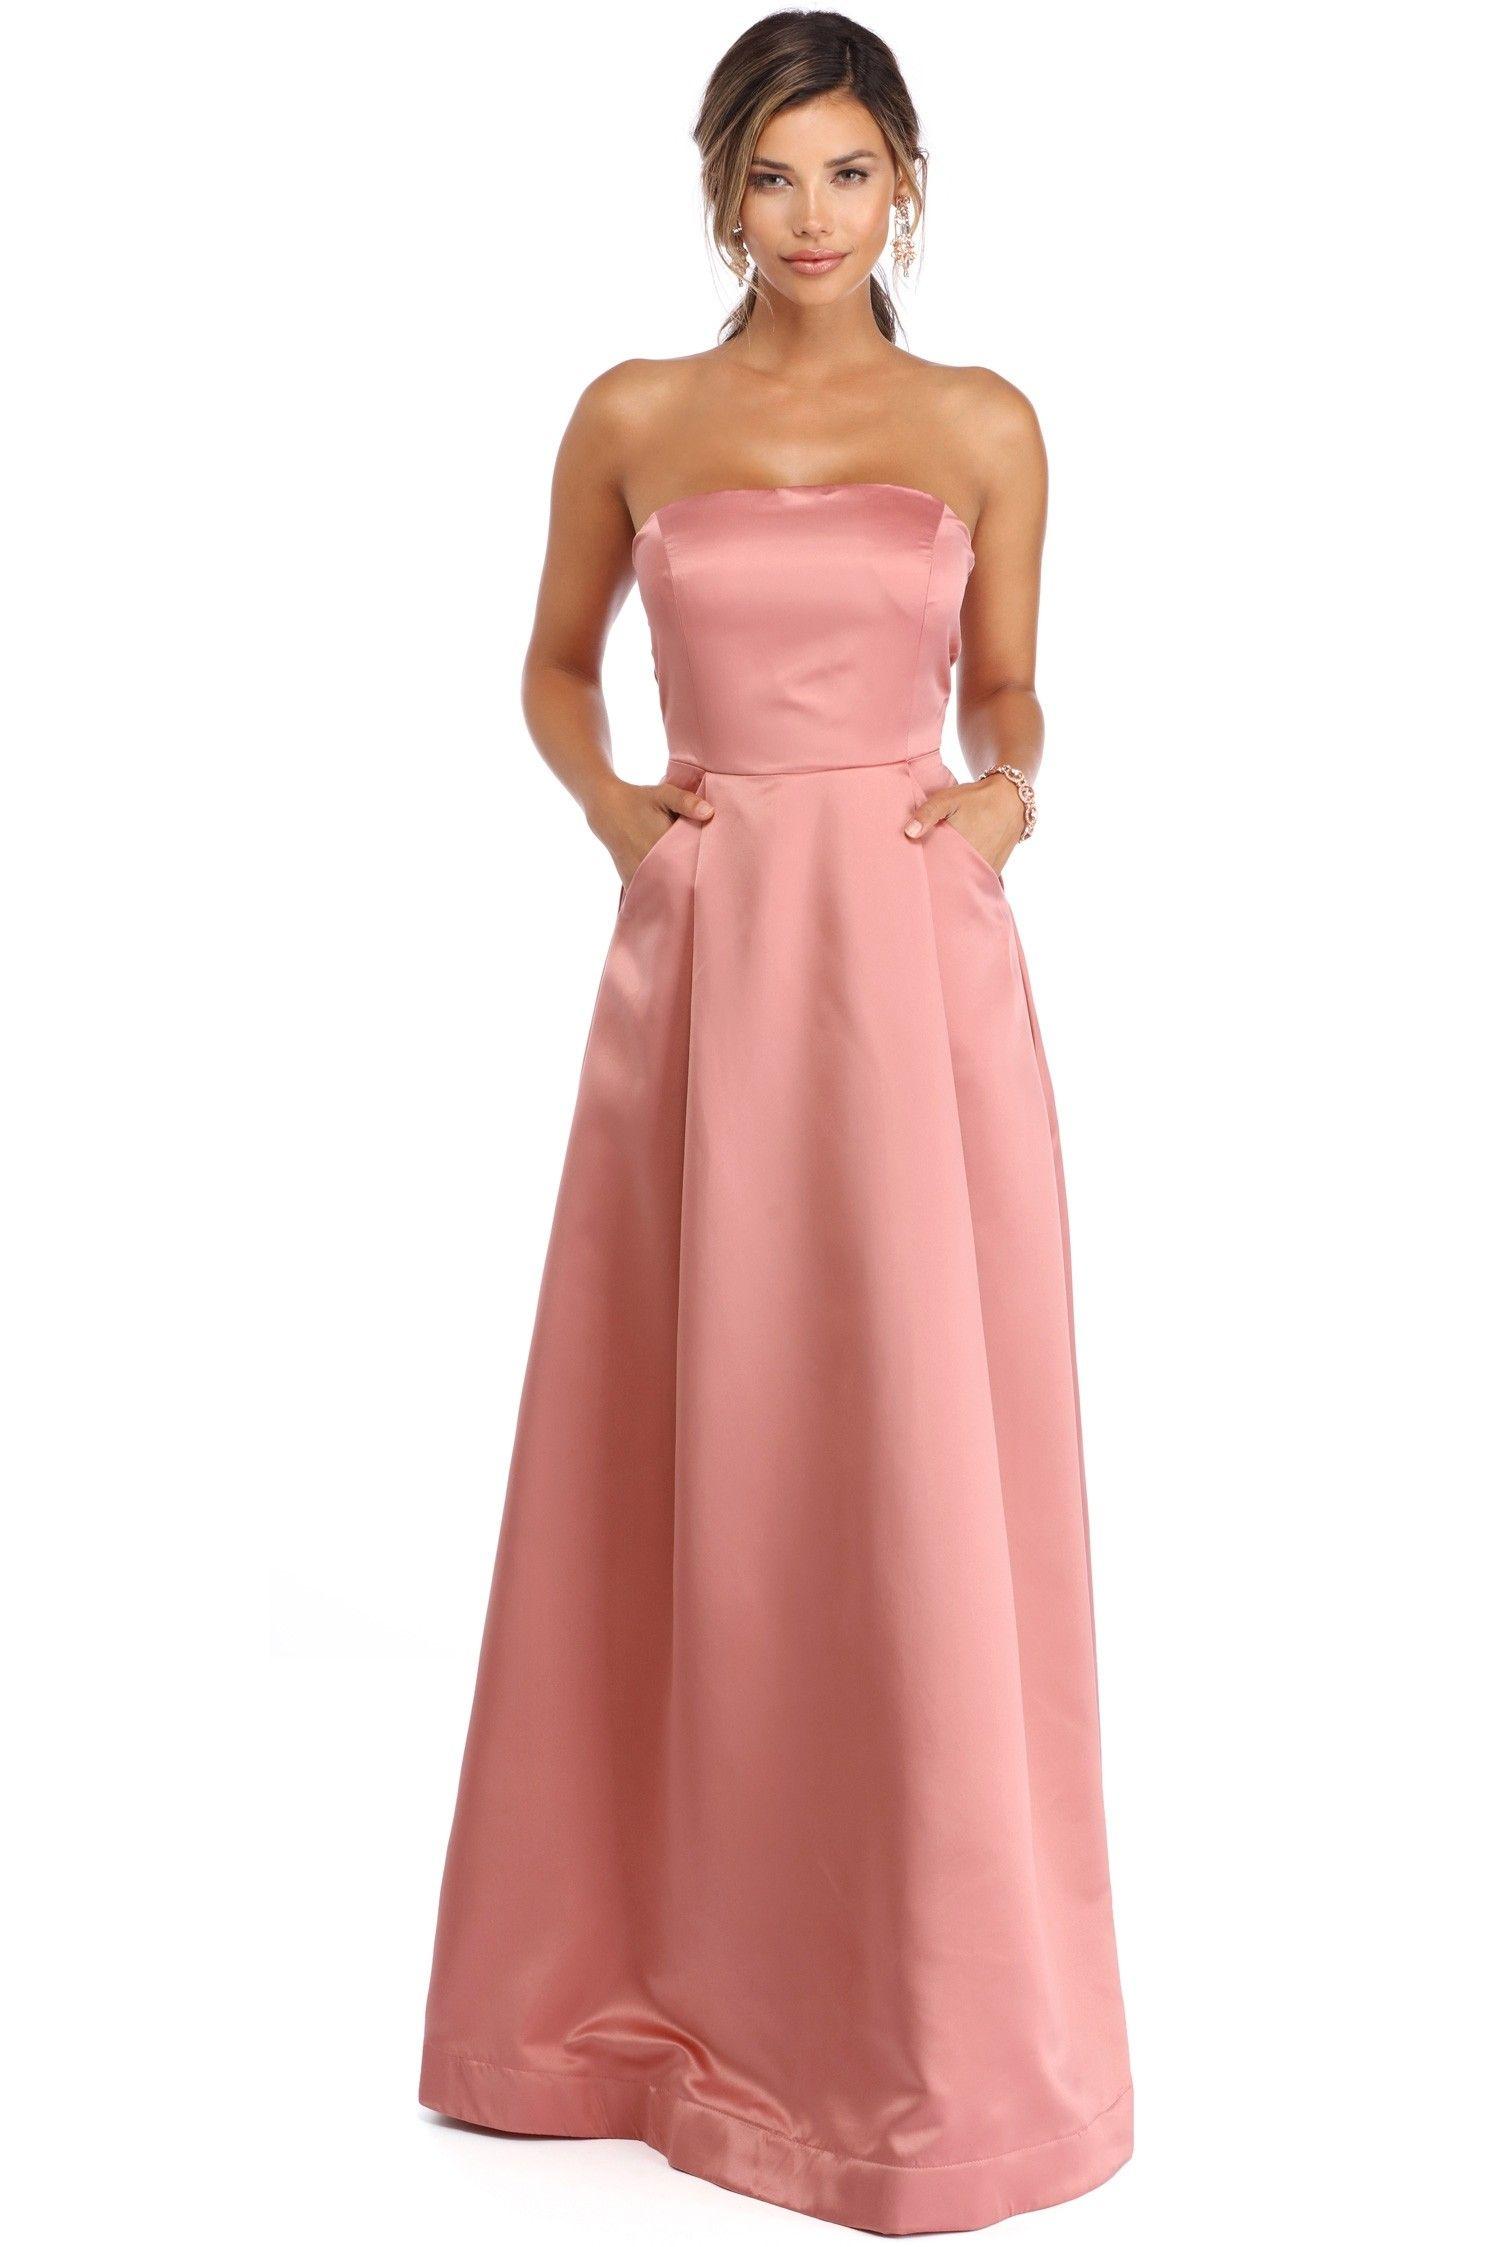 FINAL SALE- Athena Pink Strapless Satin Ballgown